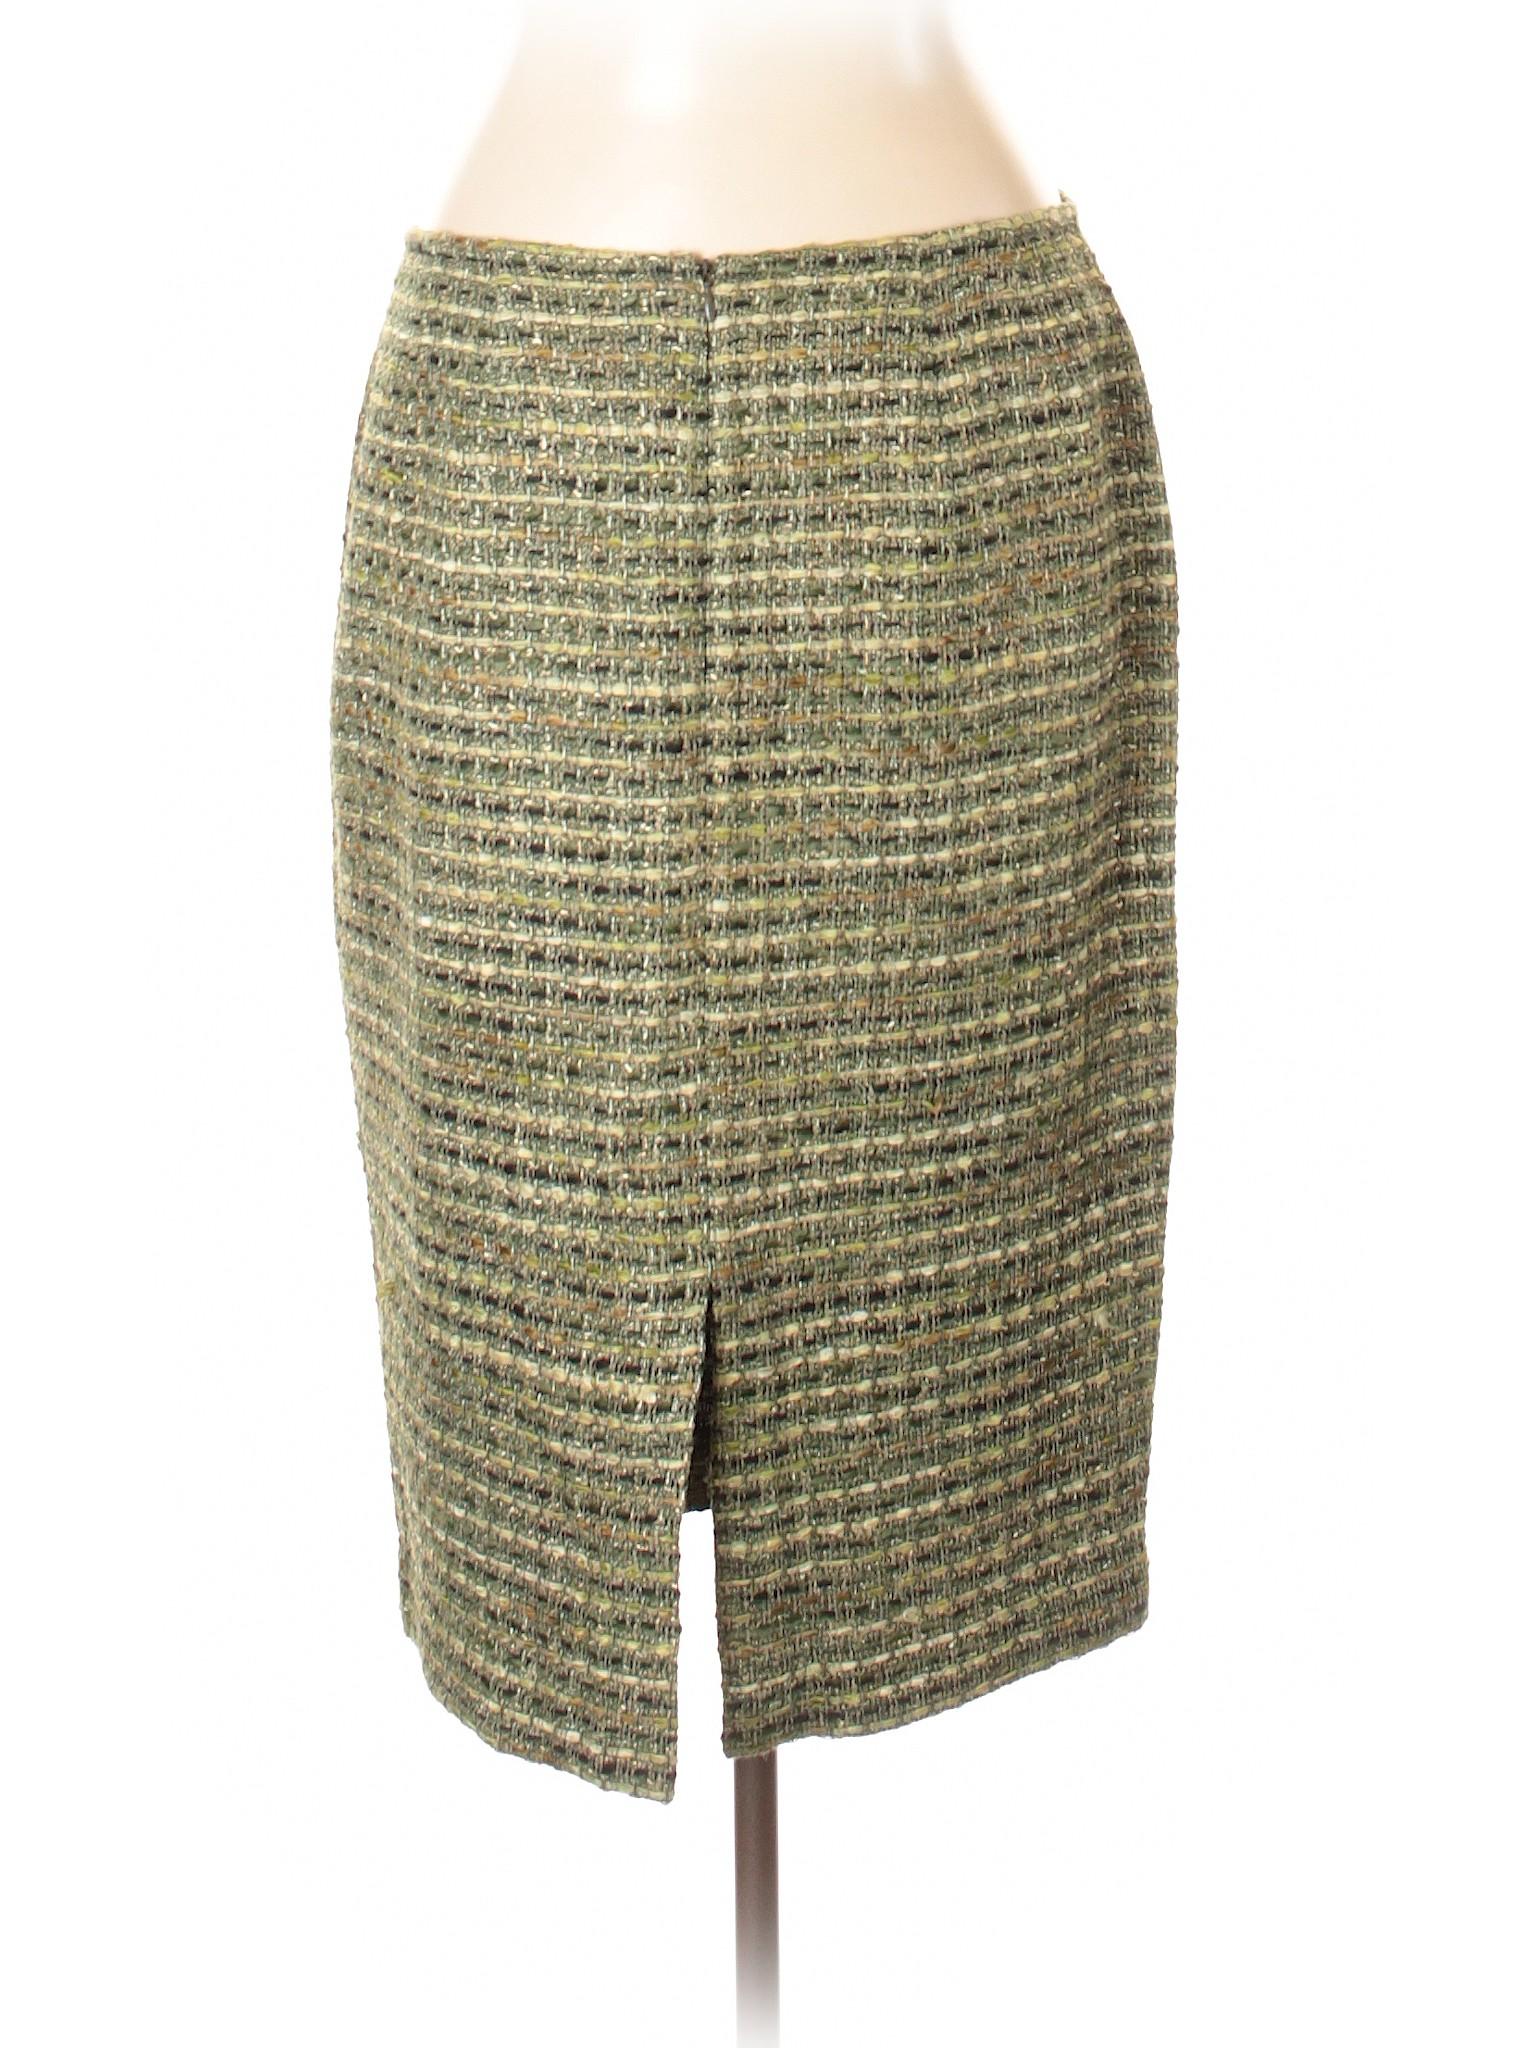 Casual Skirt Boutique Casual Casual Boutique Skirt Skirt Boutique wxwOtz